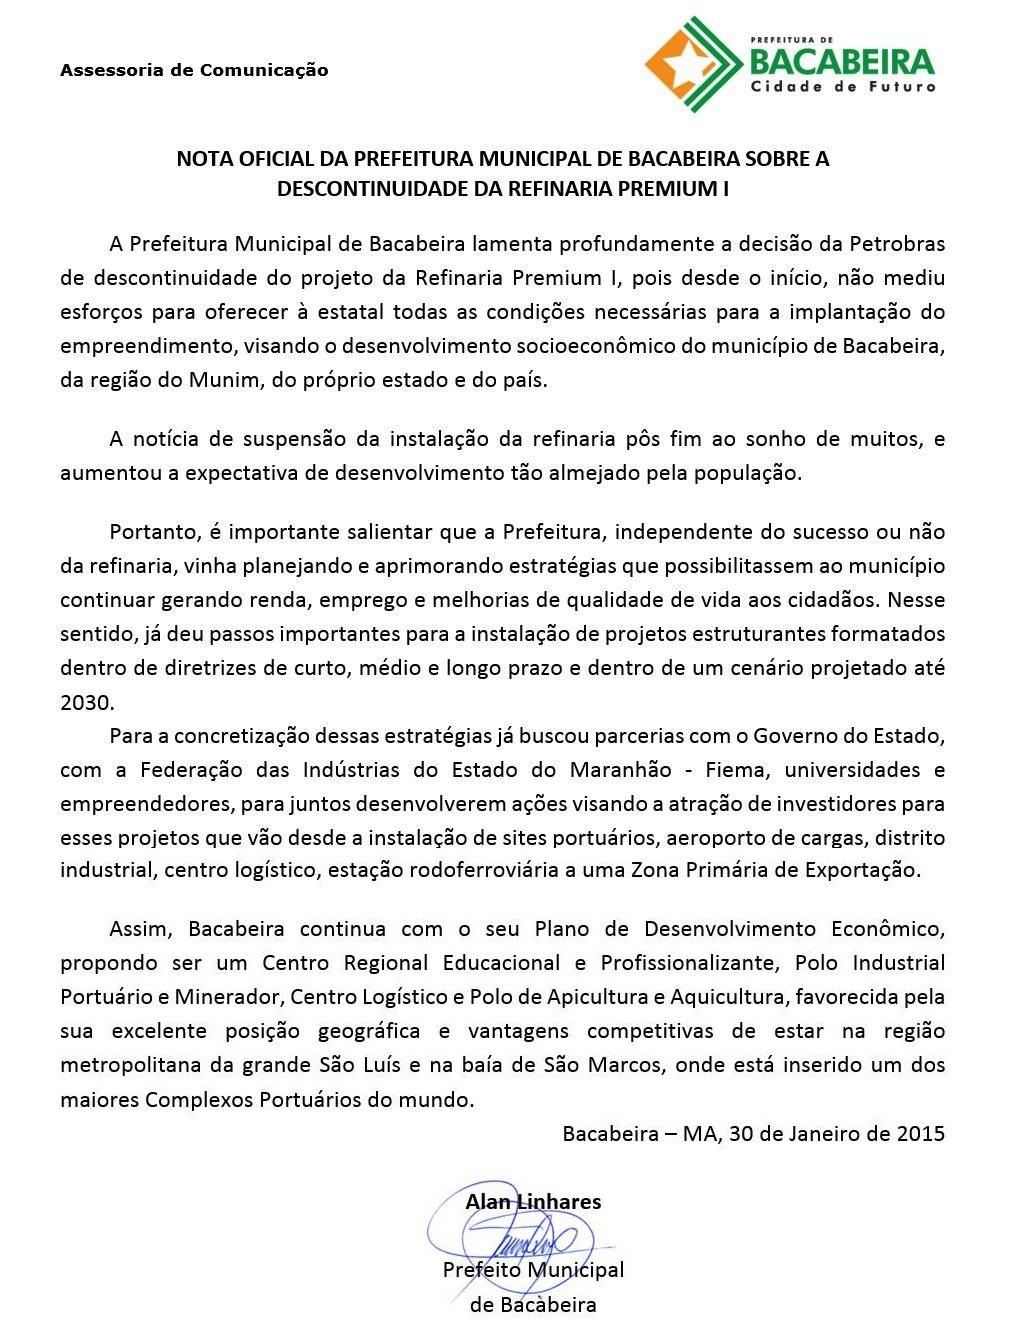 NOTA PREFEITURA DE BACABEIRA